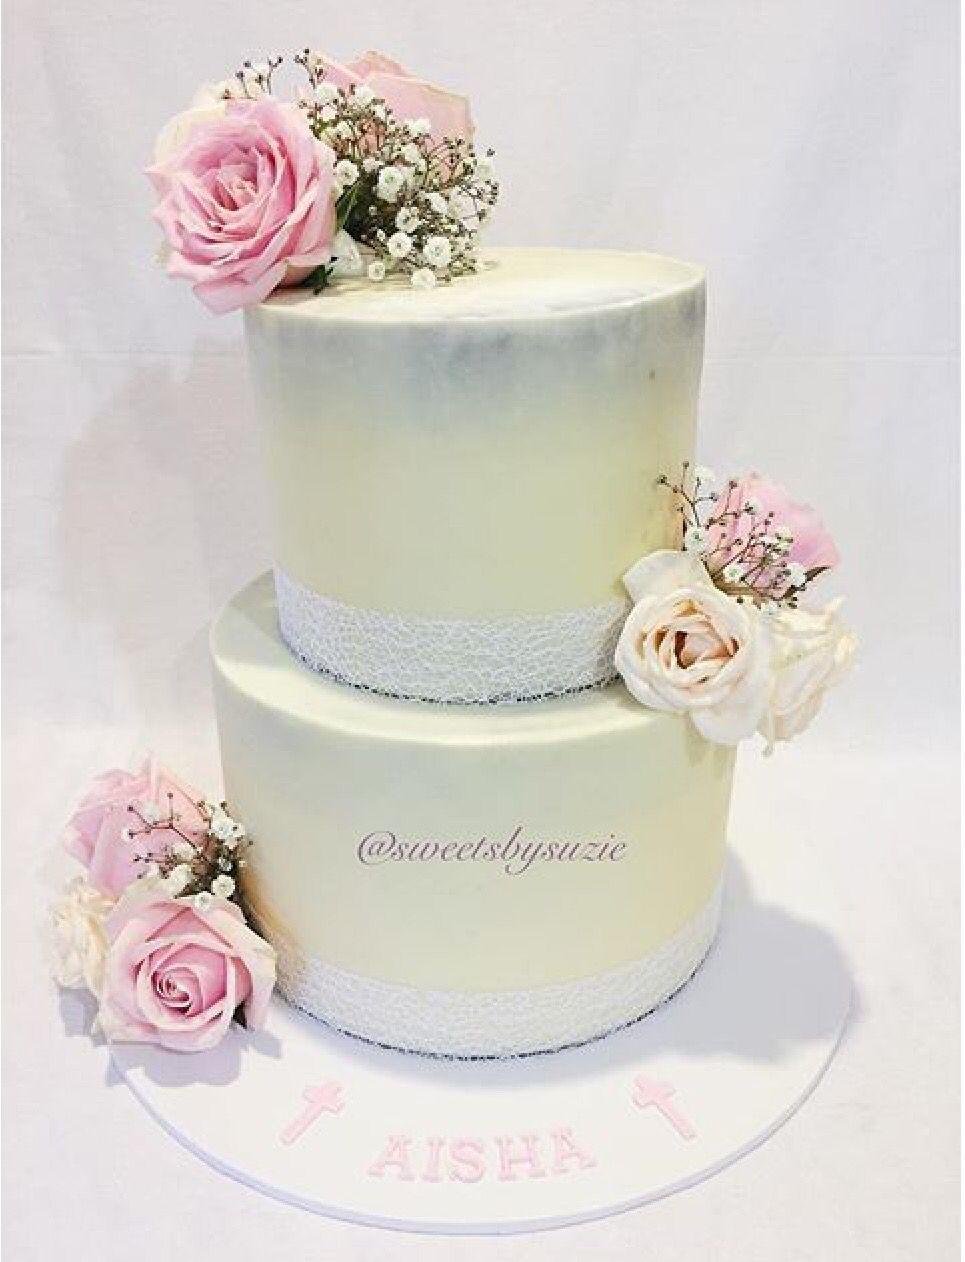 Rustic Girls Christening Cake made by Sweetsbysuzie | Sweetsbysuzie ...